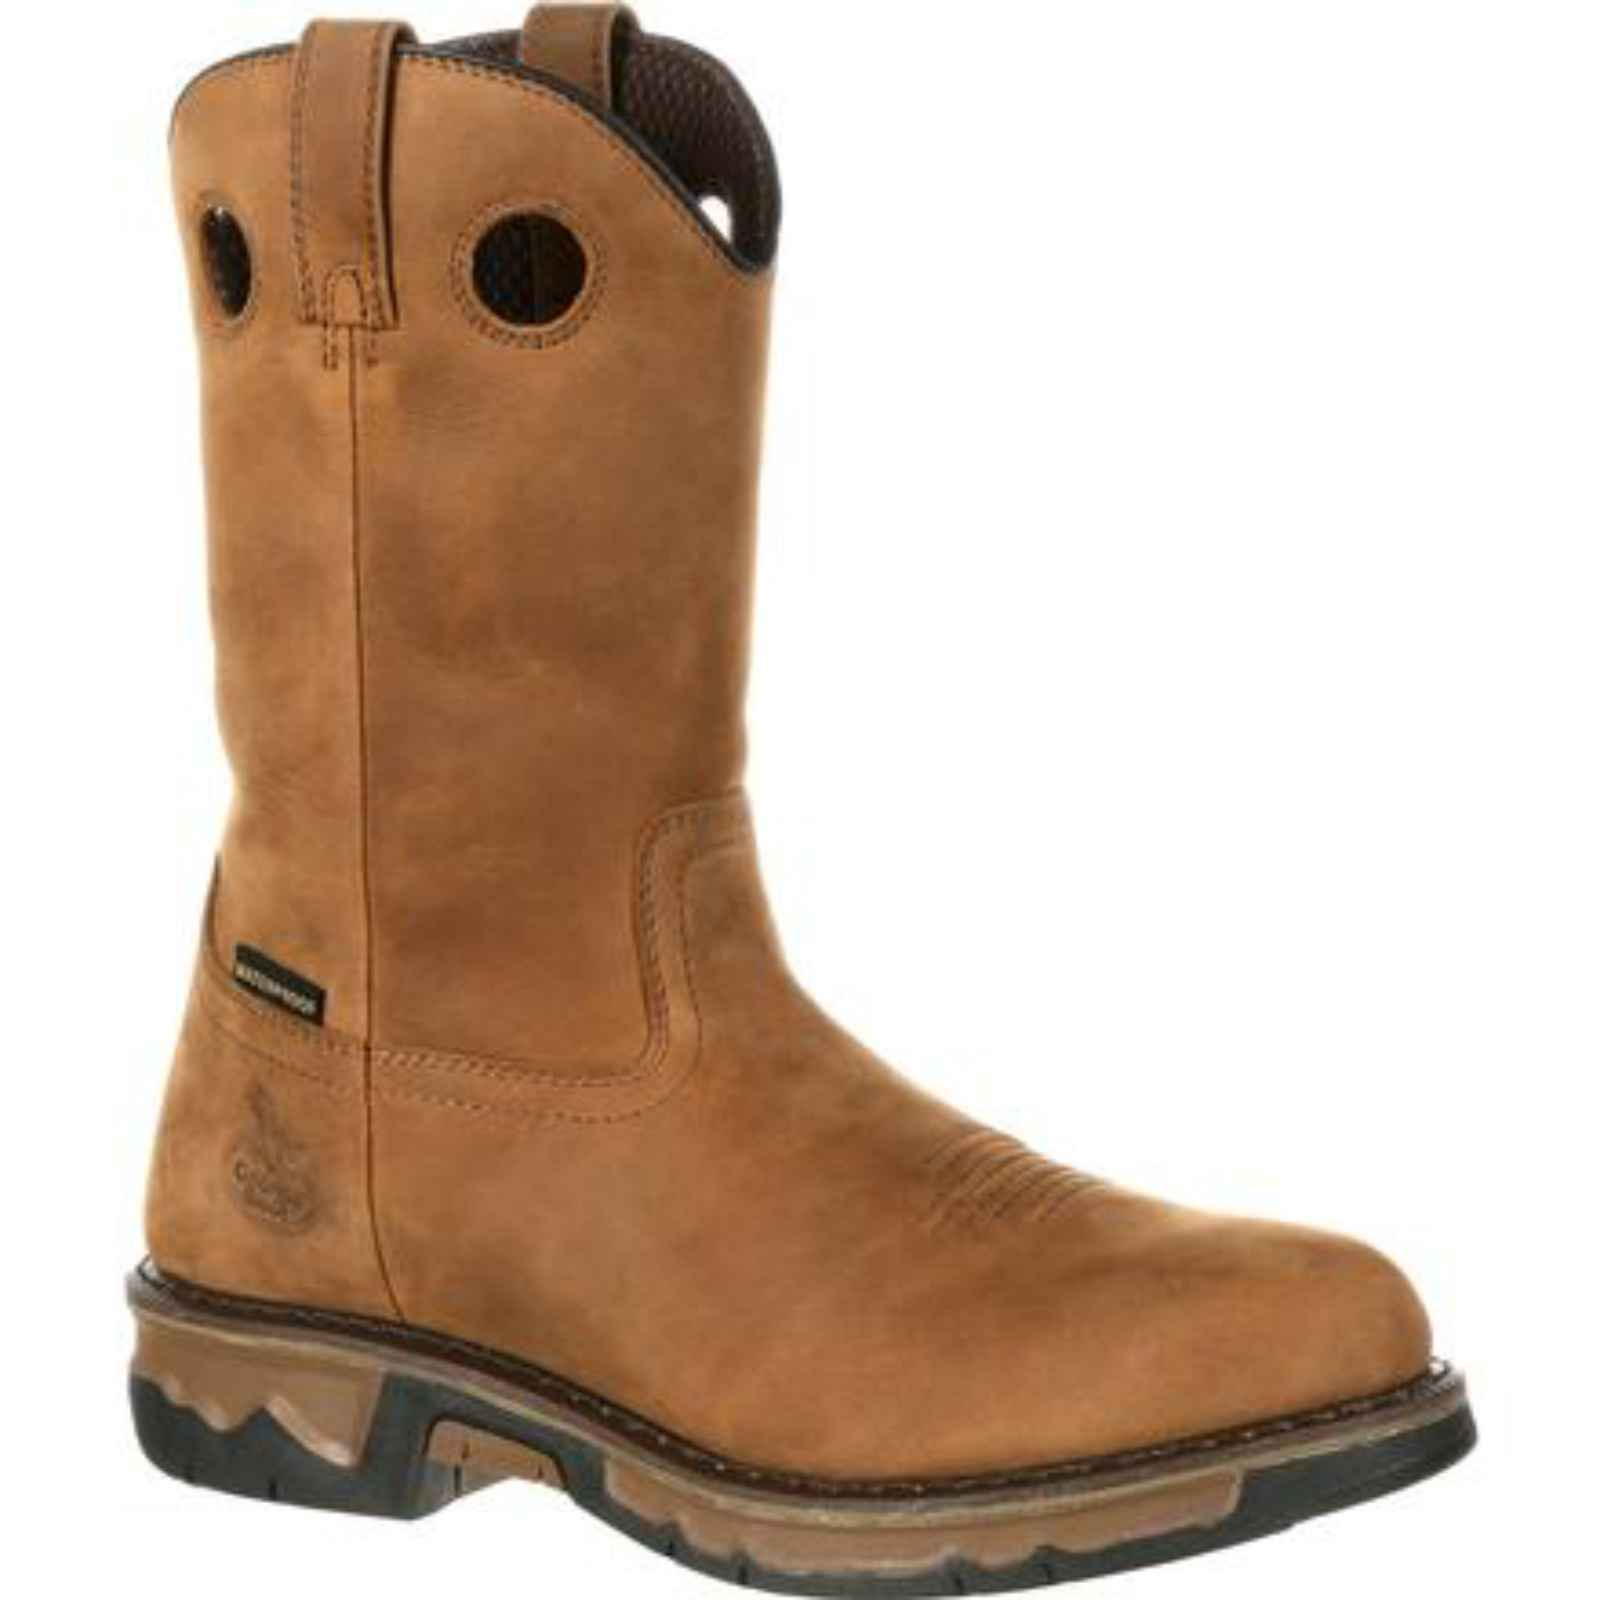 GEORGIA BOOT Carbo-Tec Composite Toe Waterproof Work Boot Boot Boot GB00102 4aa8e6